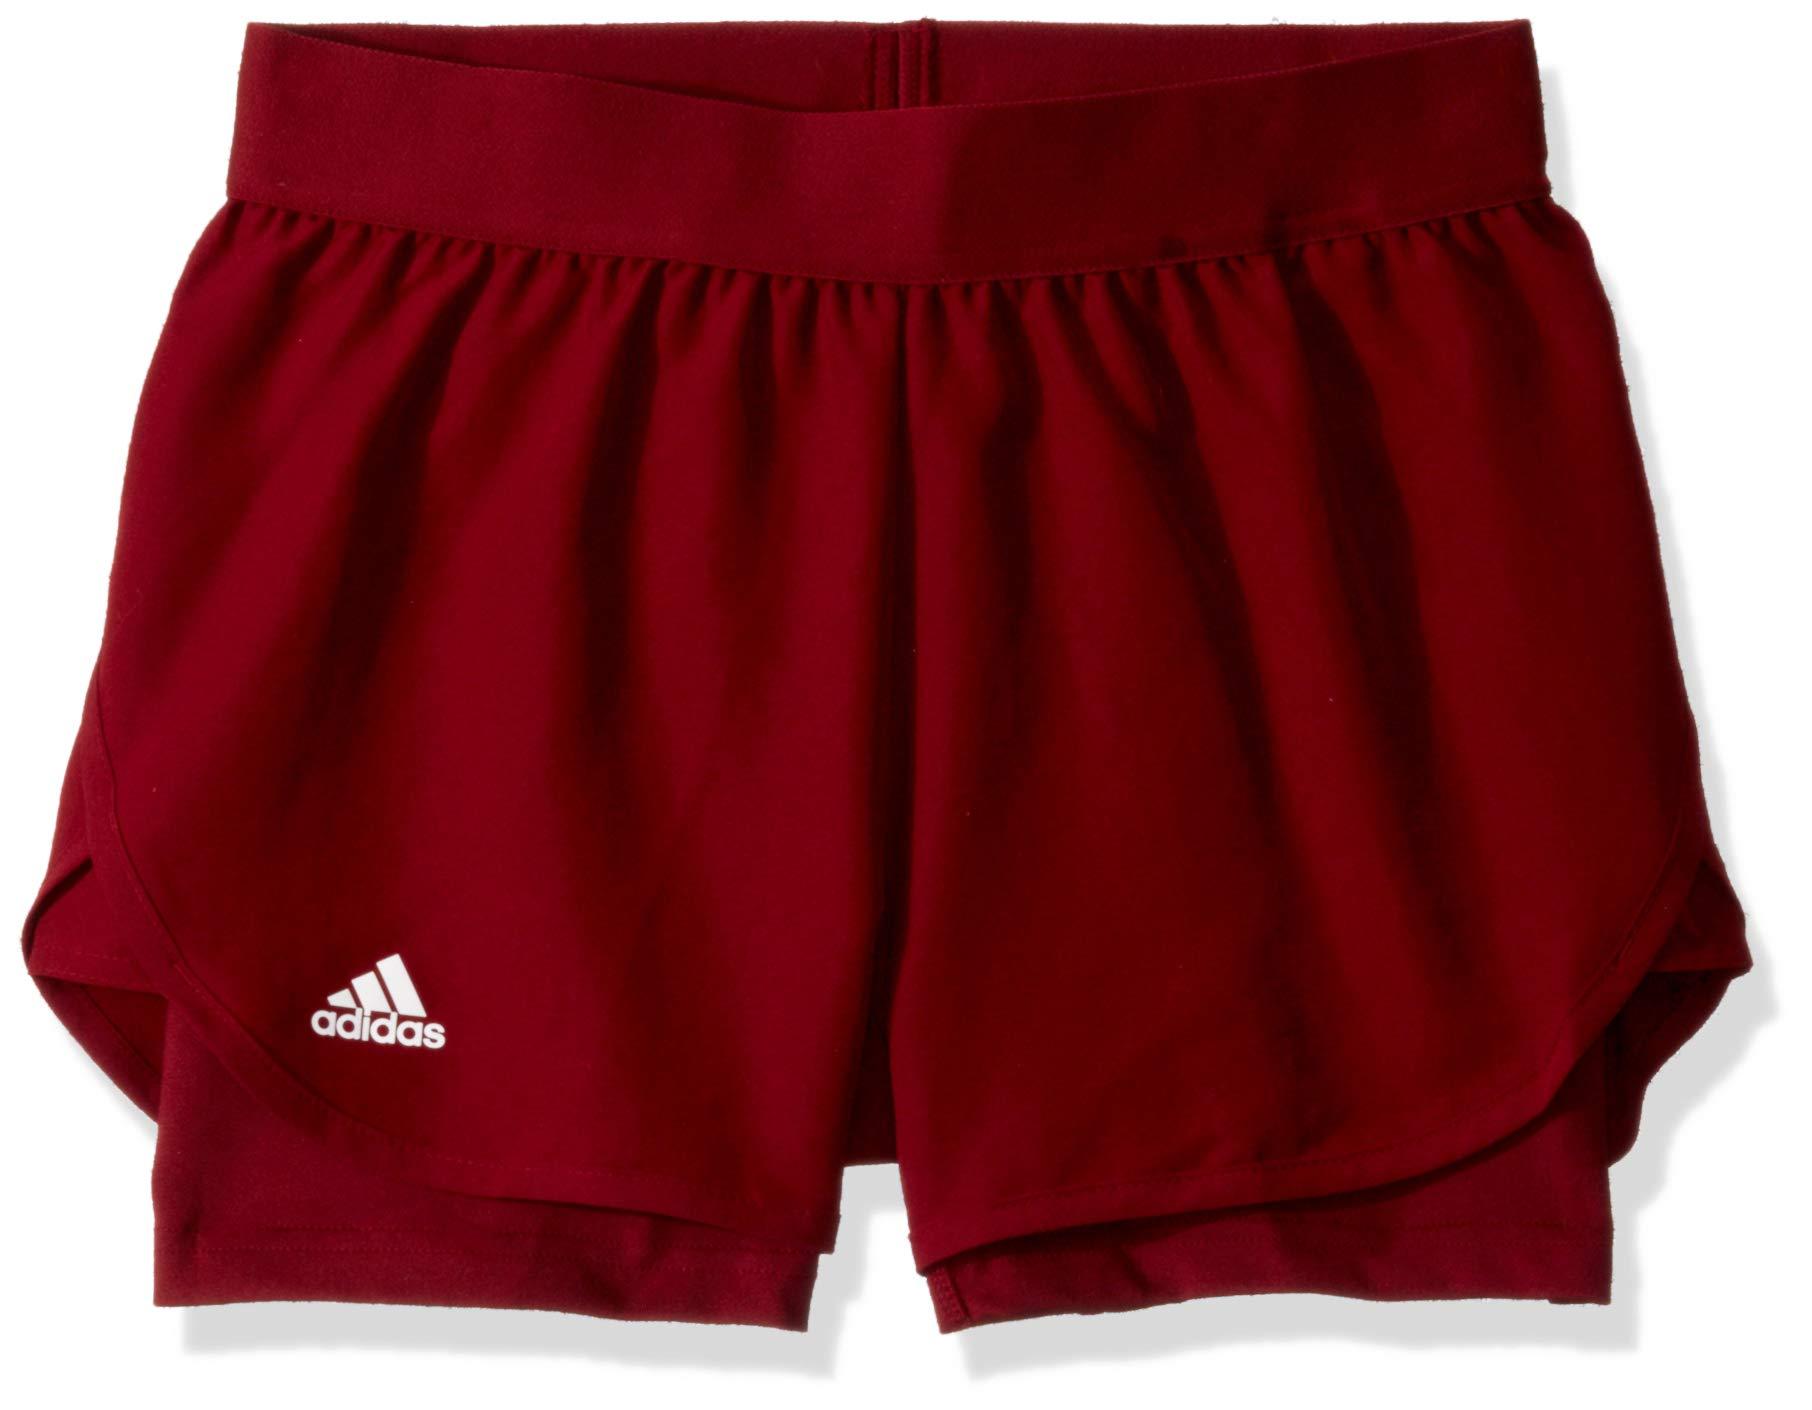 adidas Junior Girls' Club Tennis Shorts, Collegiate Burgundy/Collegiate Burgundy, X-Small